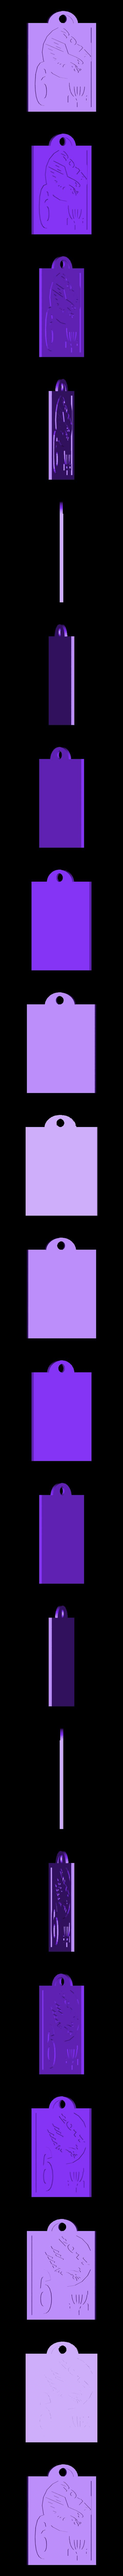 Disc_Bag_Tag_6.stl Download free STL file Disc Golf Bag Tag • 3D print design, mrhers2